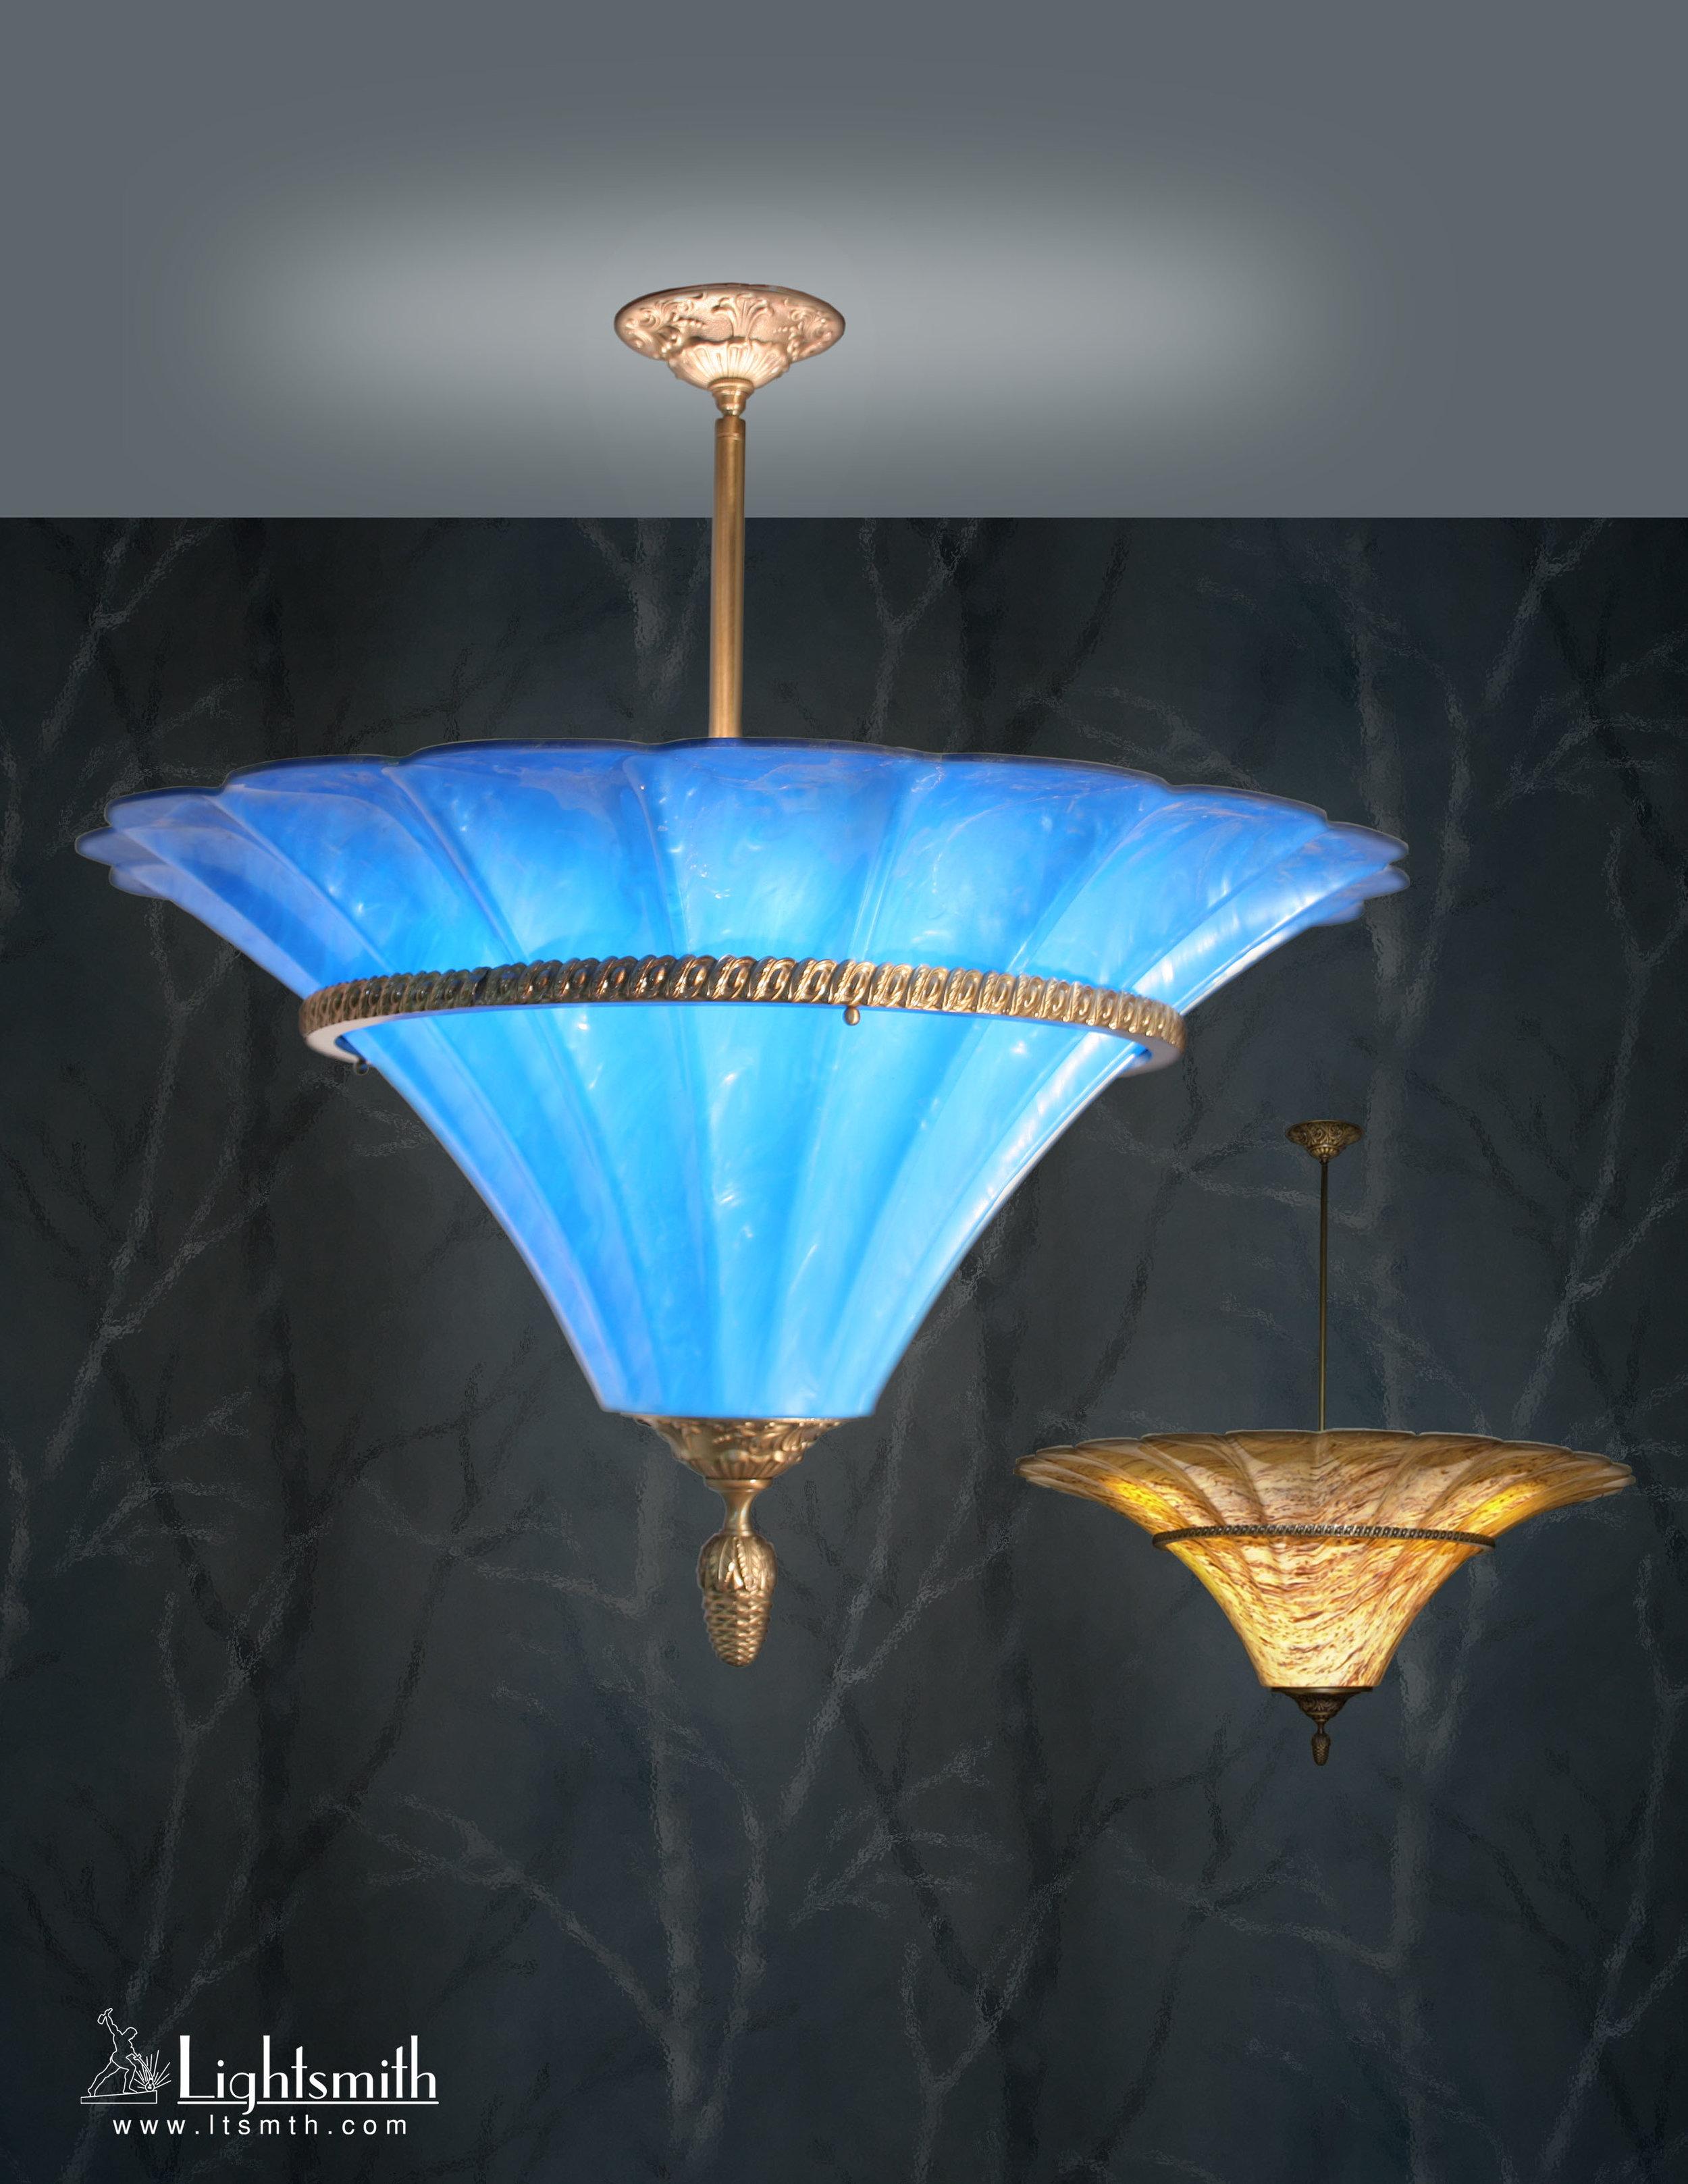 PD-4204 - Satin Brass - Sea Blue Acrylic    PD-4205 - Antique Brass - Natural Horn Acrylic